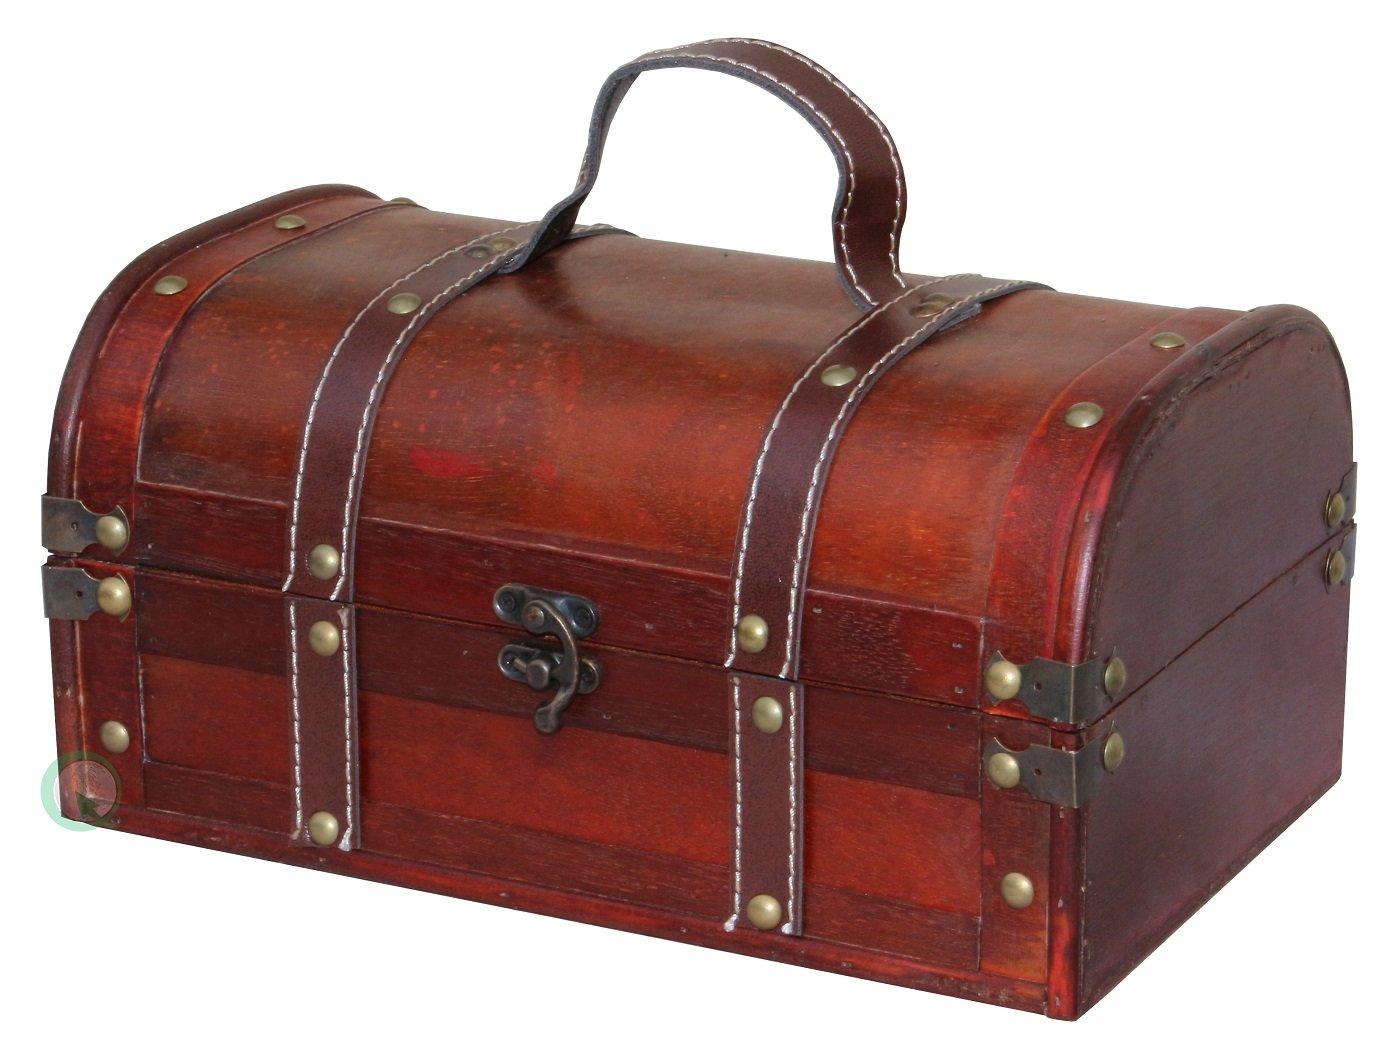 Vintiquewise(TM Decorative Wood Treasure Box - Wooden Trunk Chest Quickway Imports QI003004.L